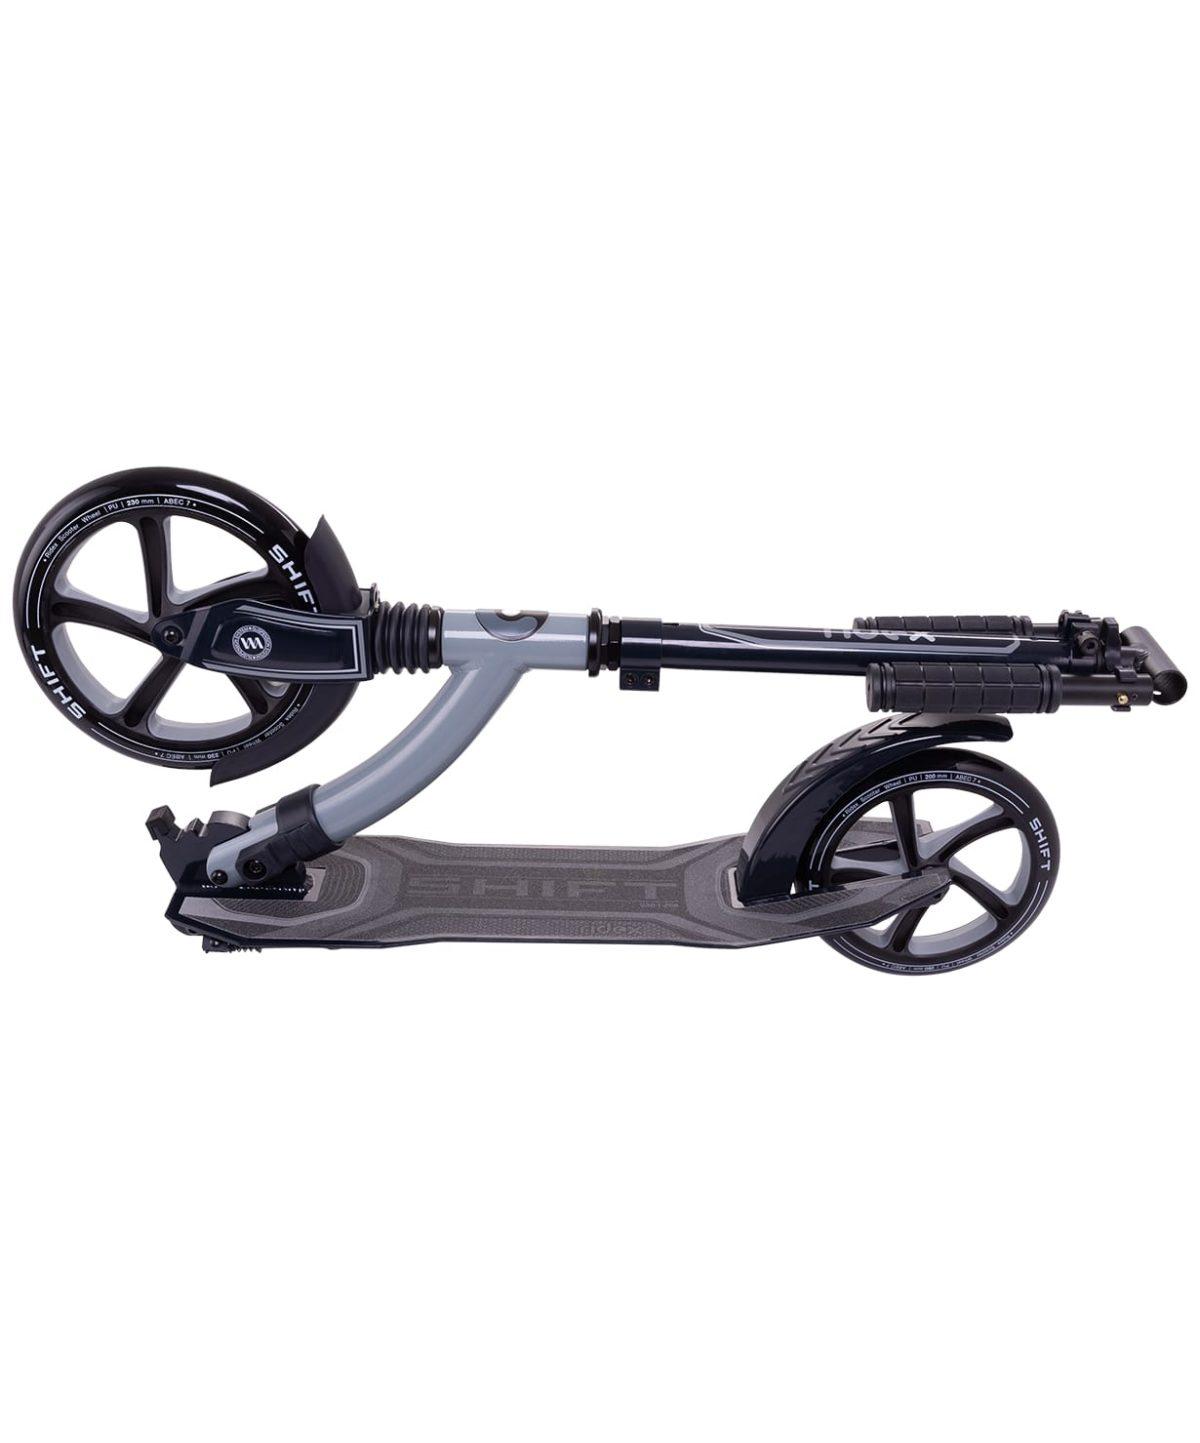 RIDEX Shift Самокат 2-колесный 230/200 мм  Shift: серый - 6